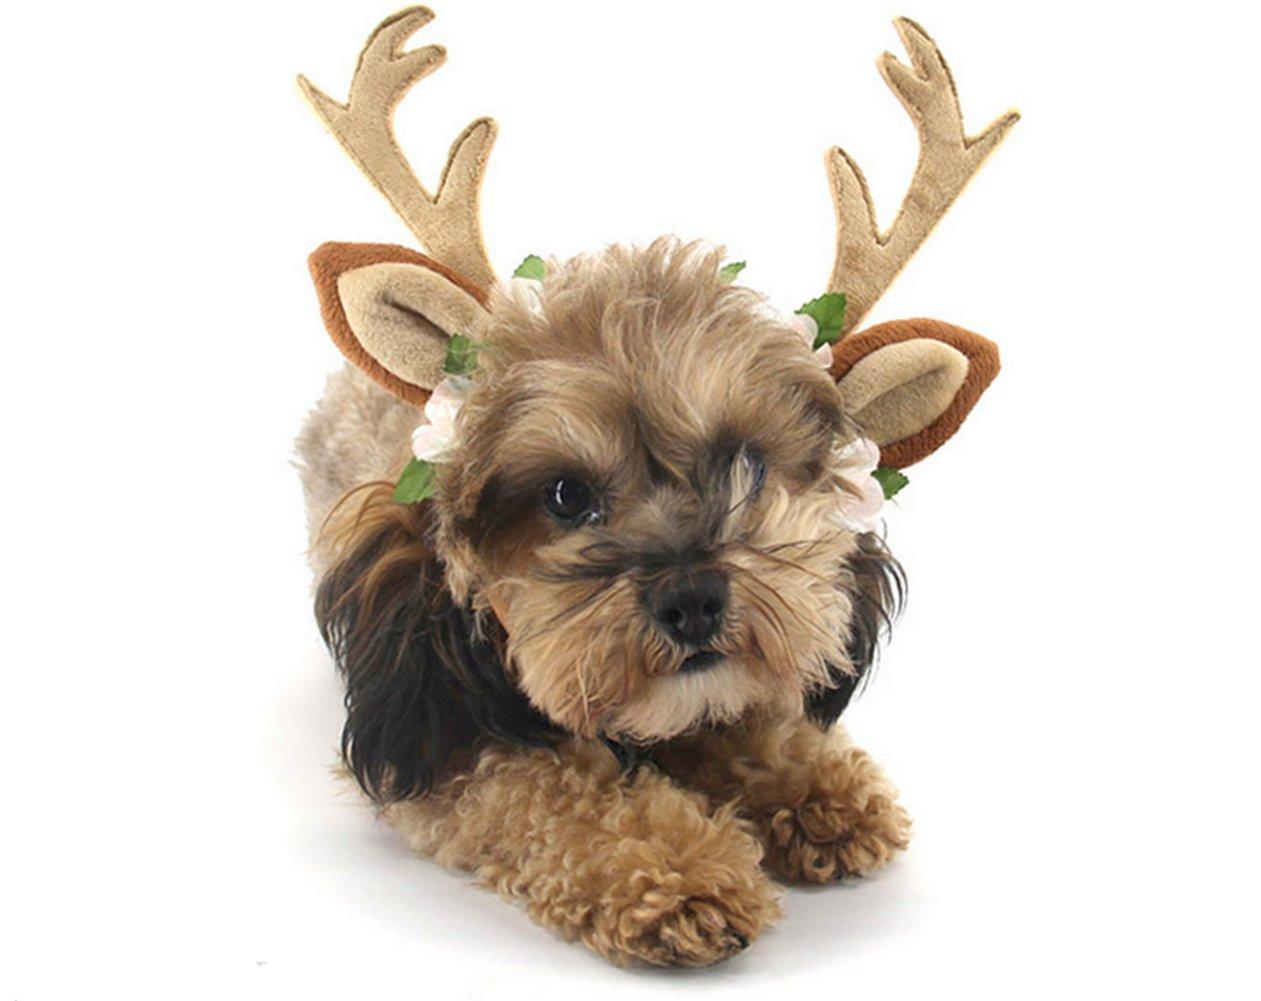 Vevins Pet Antlers Headband Christmas Halloween Costume Adjustable Dogs Cats Hair Accessories, Medium Size